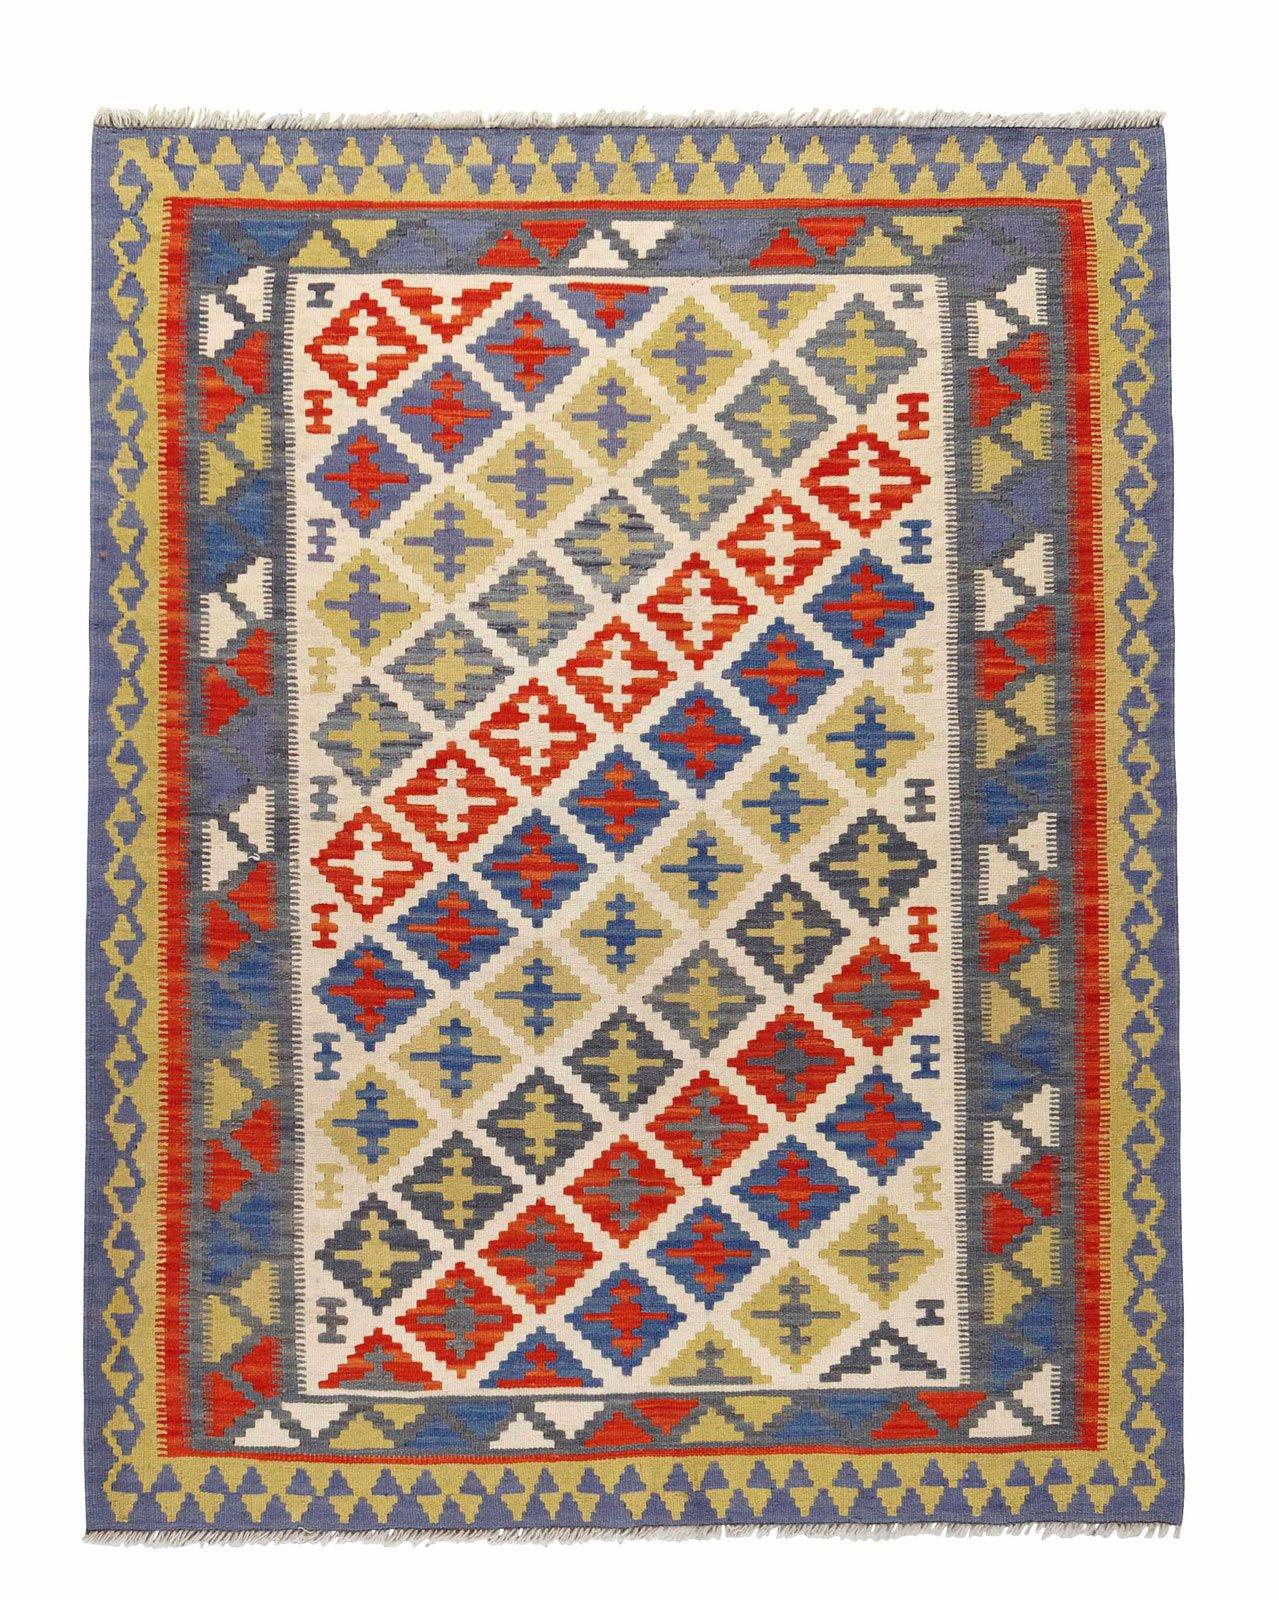 Nuovi tappeti: classici, new classic o moderni - Cose di Casa